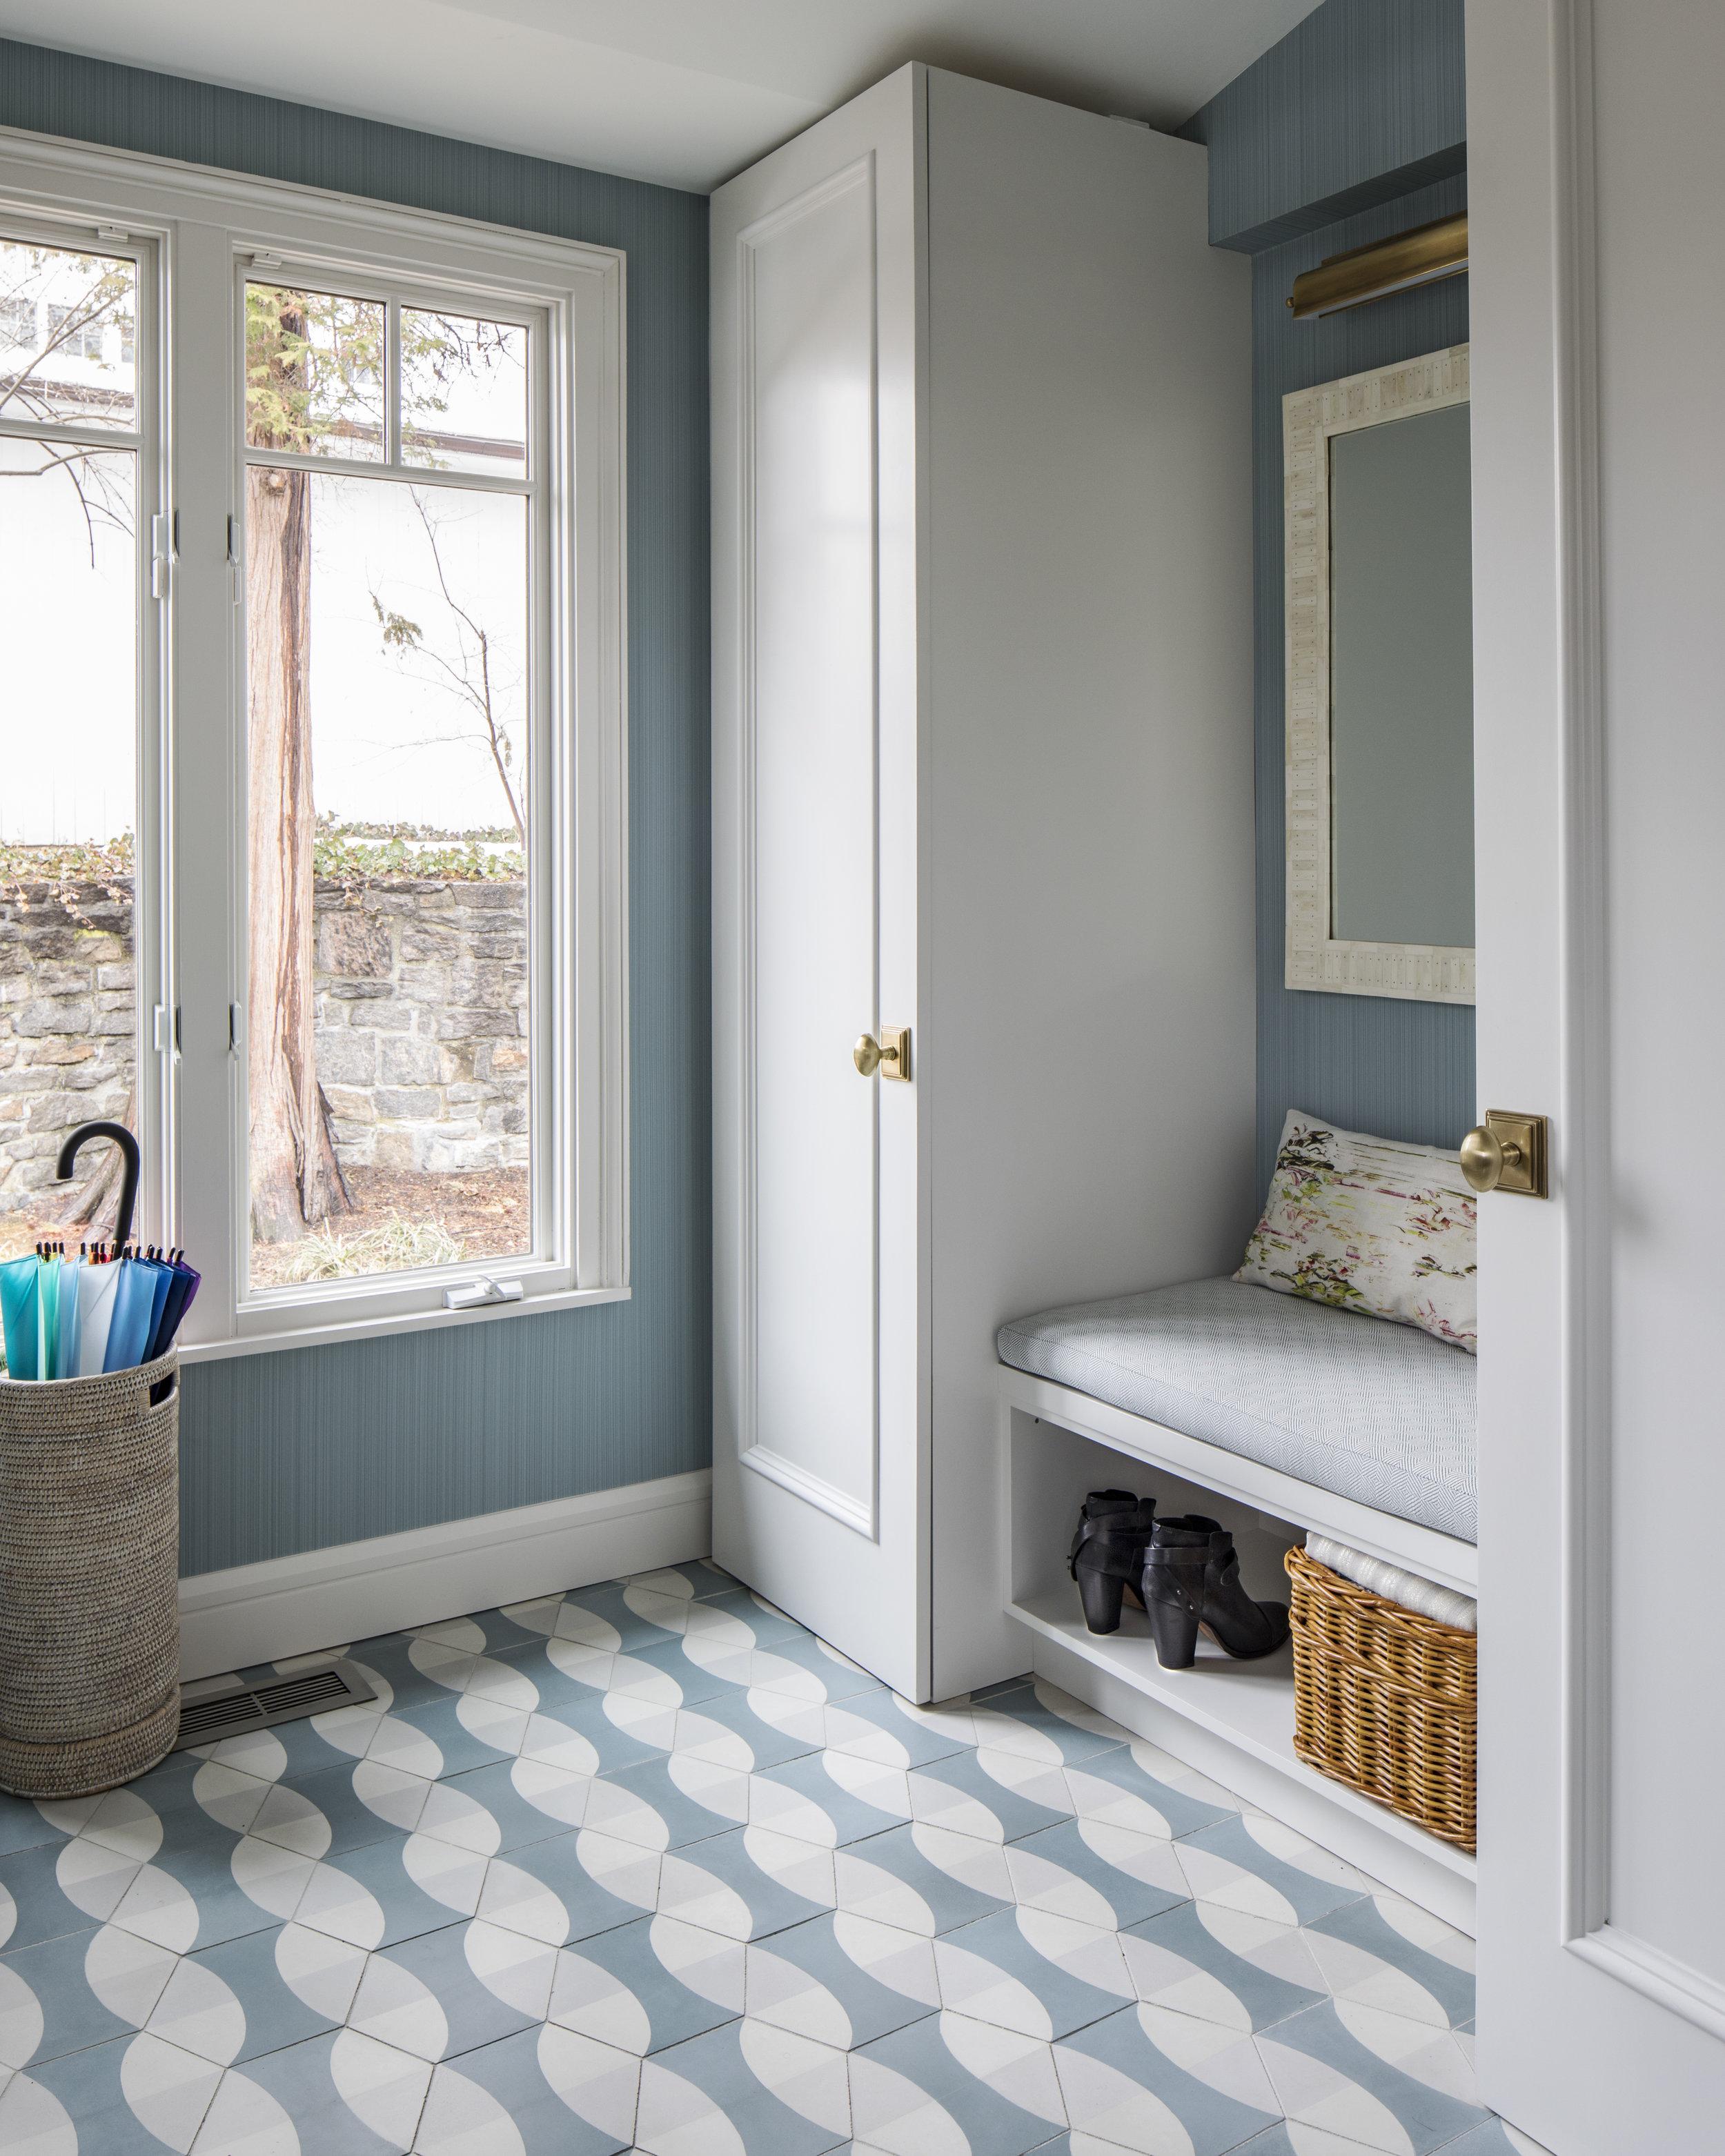 Concrete-Tile-Entry-Way-Serene-Aqua-White-Bronx-Jmorris-Design-Interior-Designer-Brooklyn-Online-Edesign.jpg